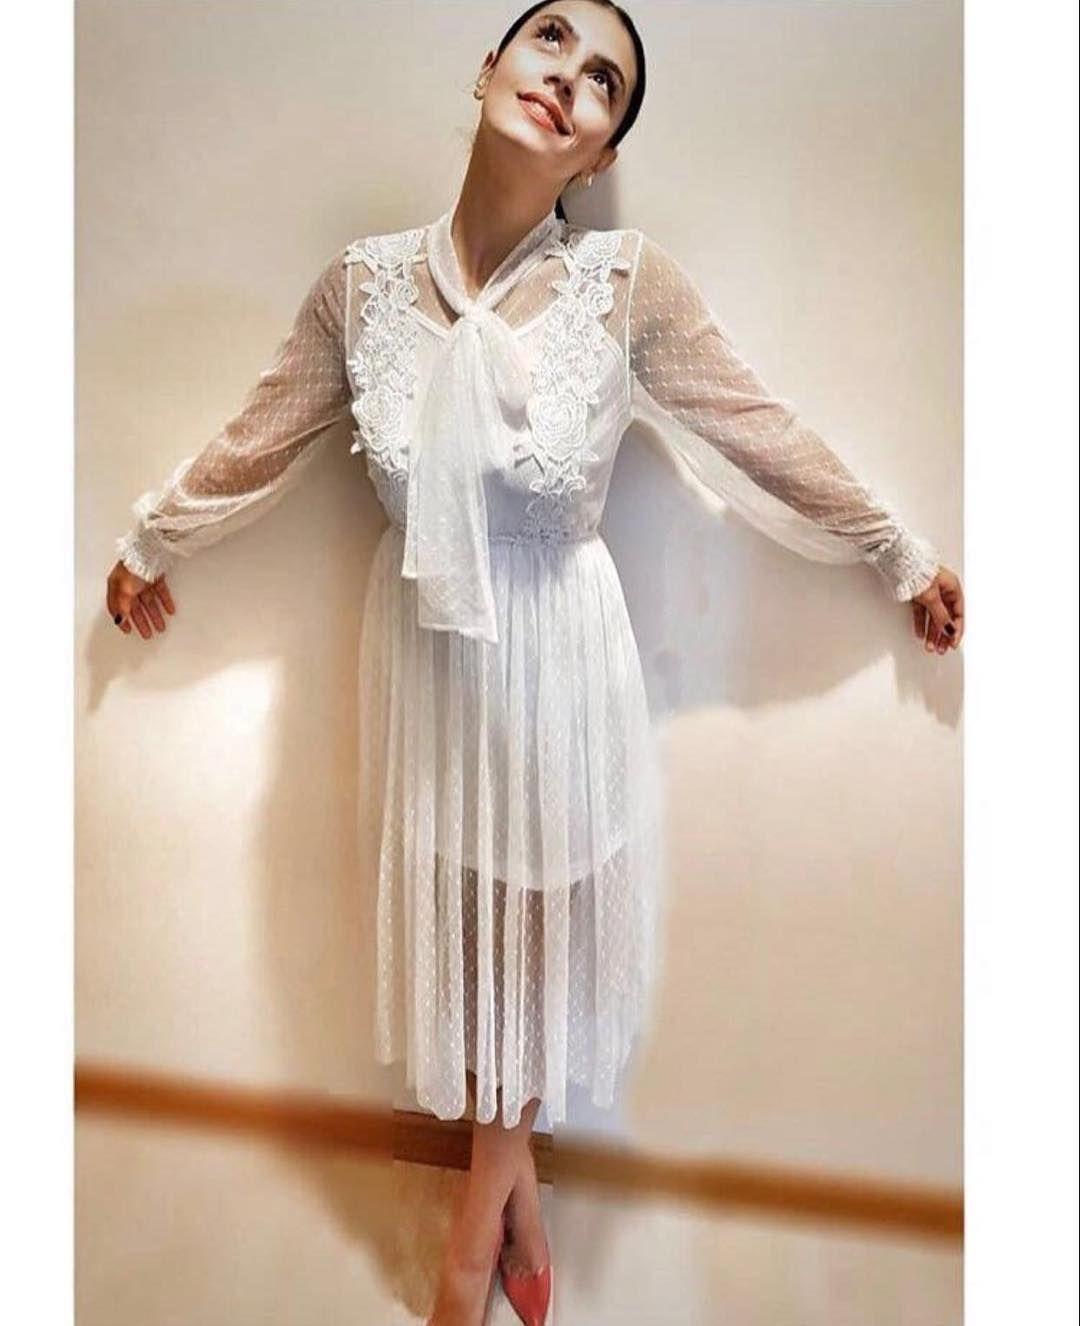 2 771 Begenme 0 Yorum Instagram Da Moda Butik Dunyasi Moda Butik Dunyasi 144 90 Fiyonklu Soft Narin Elb In 2020 Fashion Long Sleeve Dress Passion For Fashion